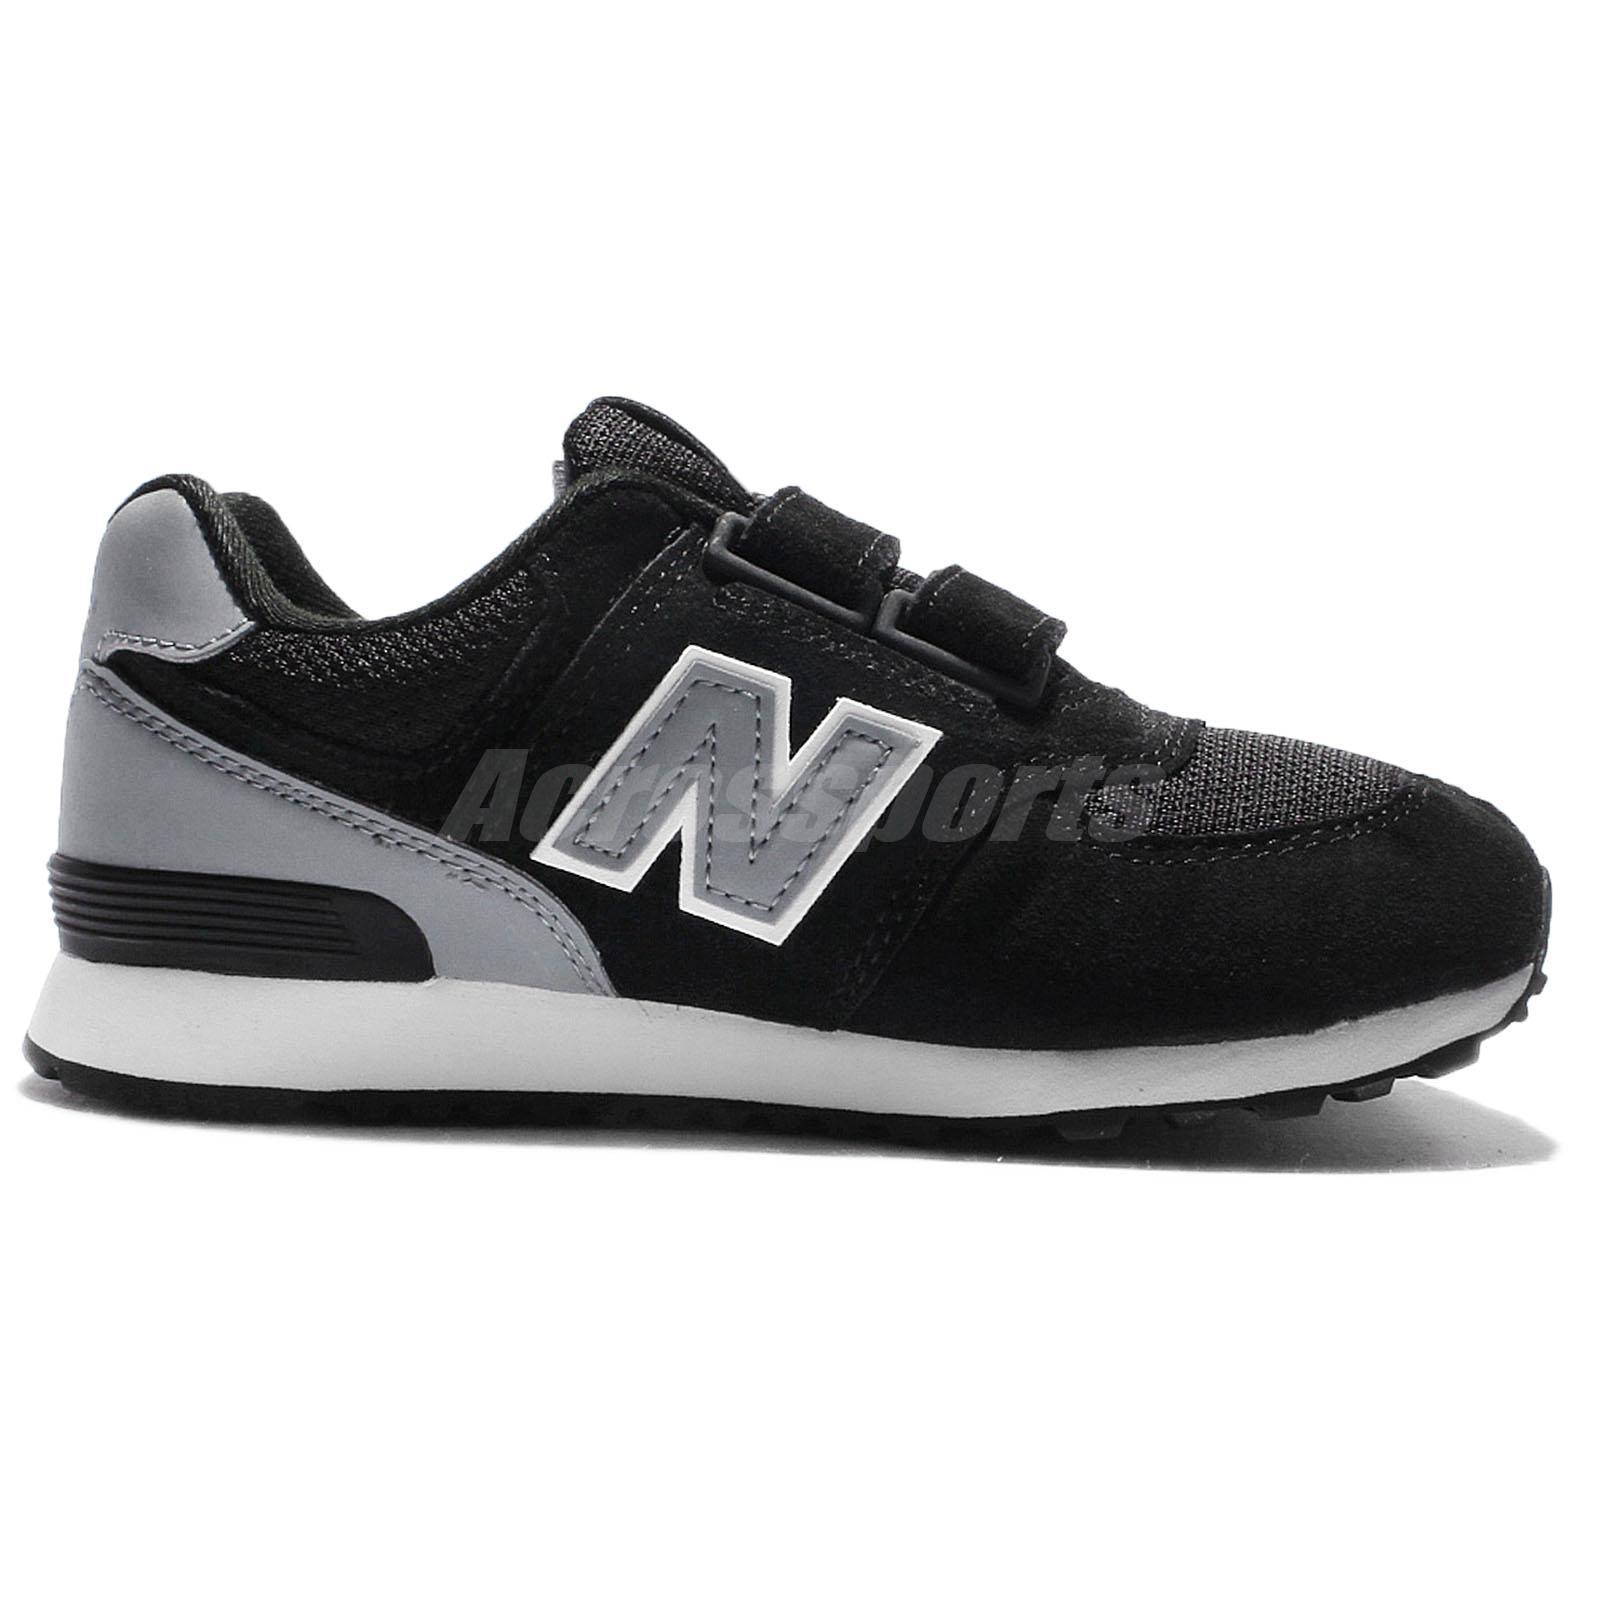 15b6b49be32ba new balance kids running shoes sale   OFF67% Discounts